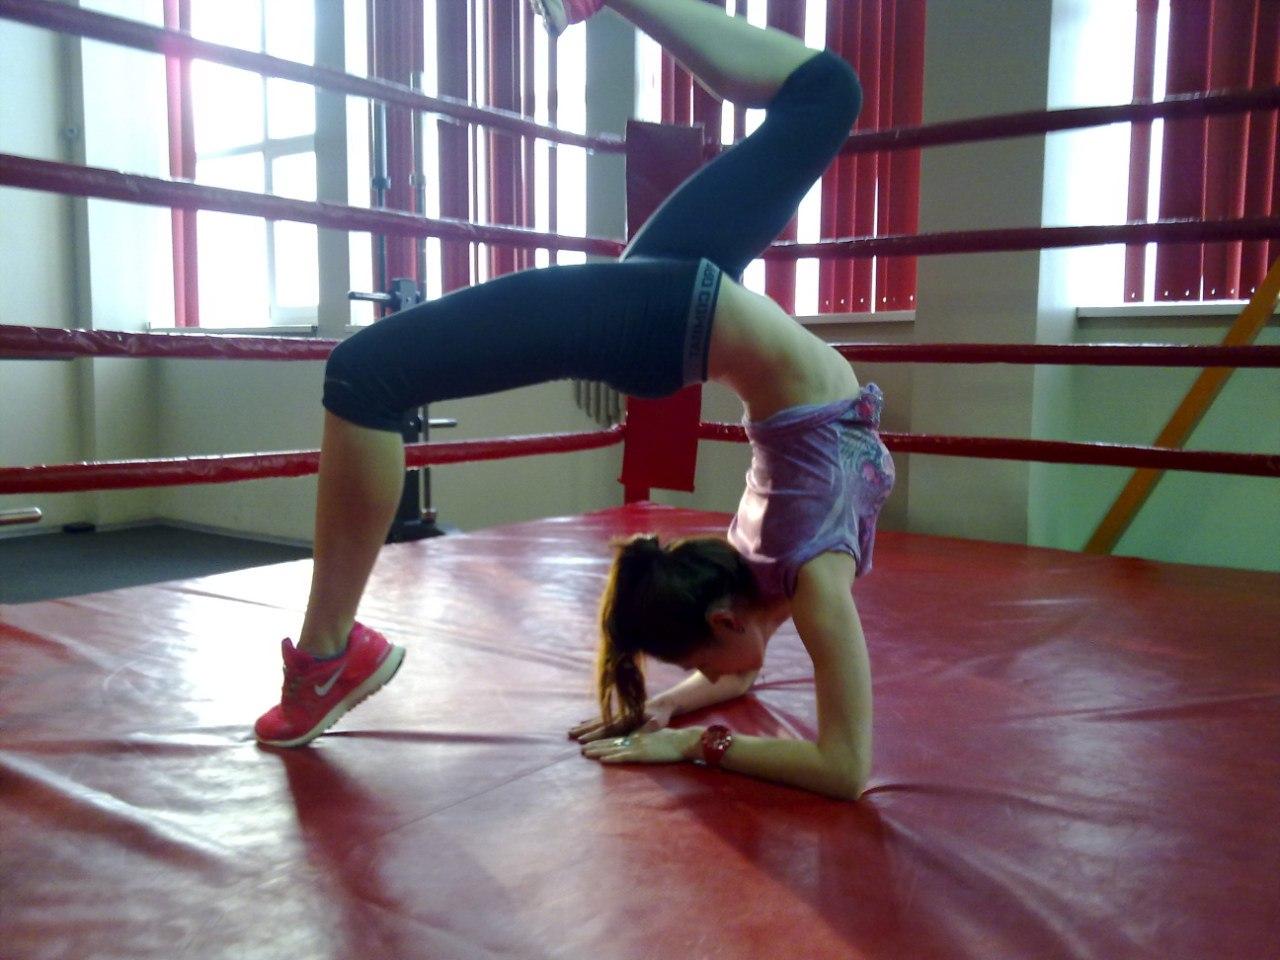 Фото девушки гимнастки 8 фотография